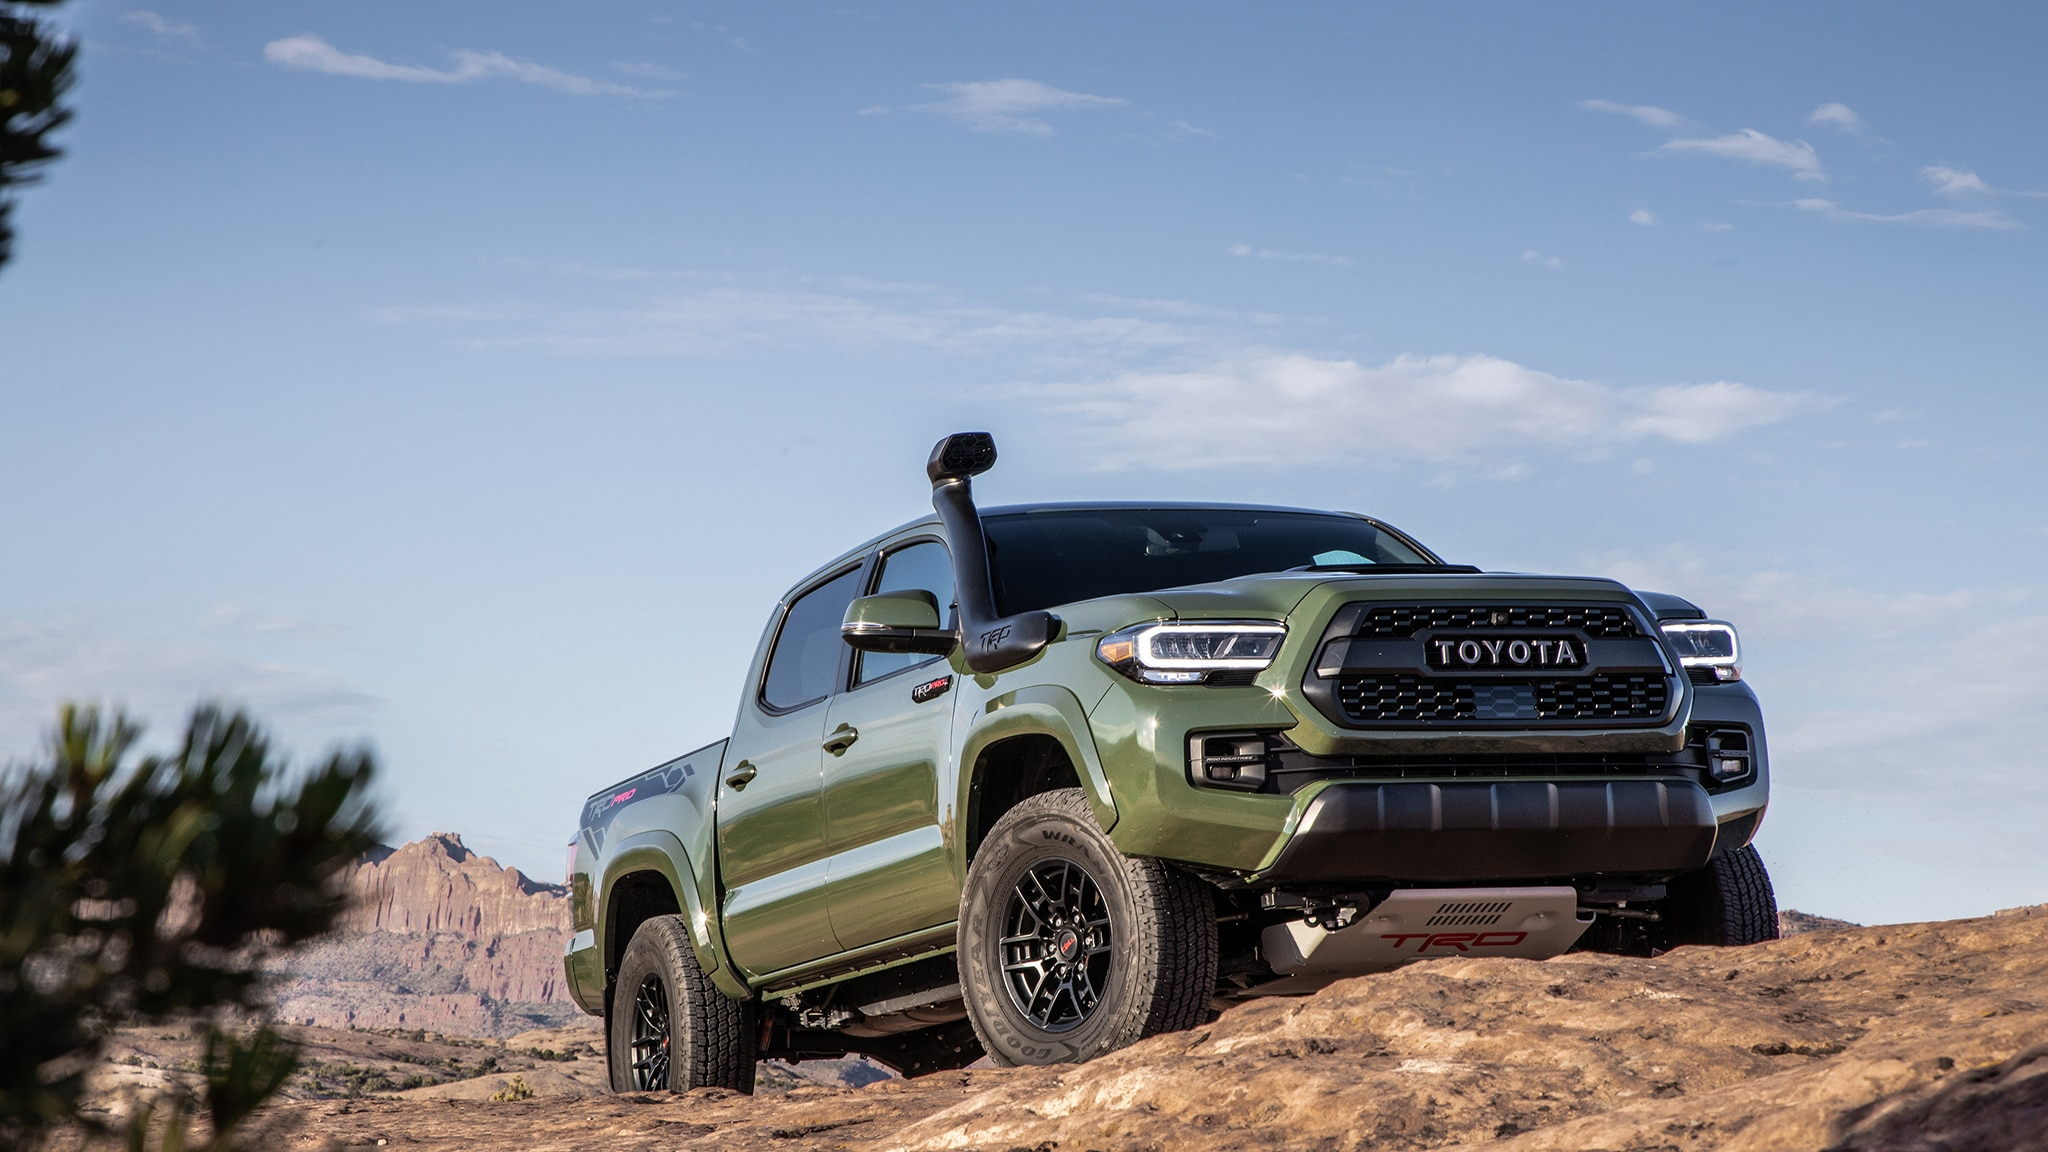 2020 Toyota Tacoma TRD Pro Goes Where Few Trucks Can ...